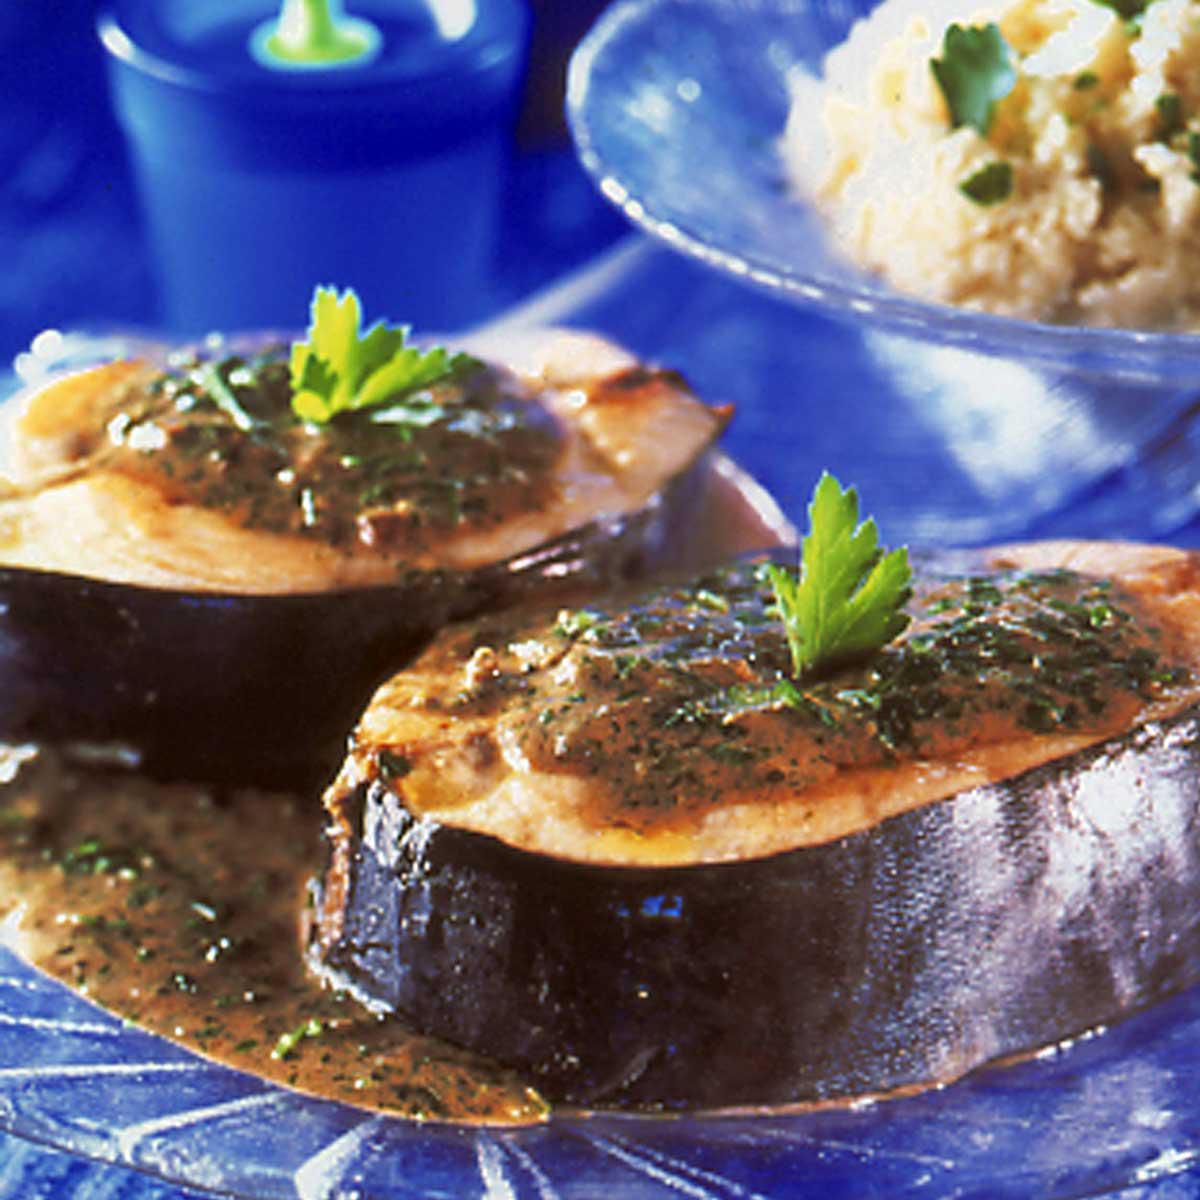 jambon precuit puis cuisson a la broche